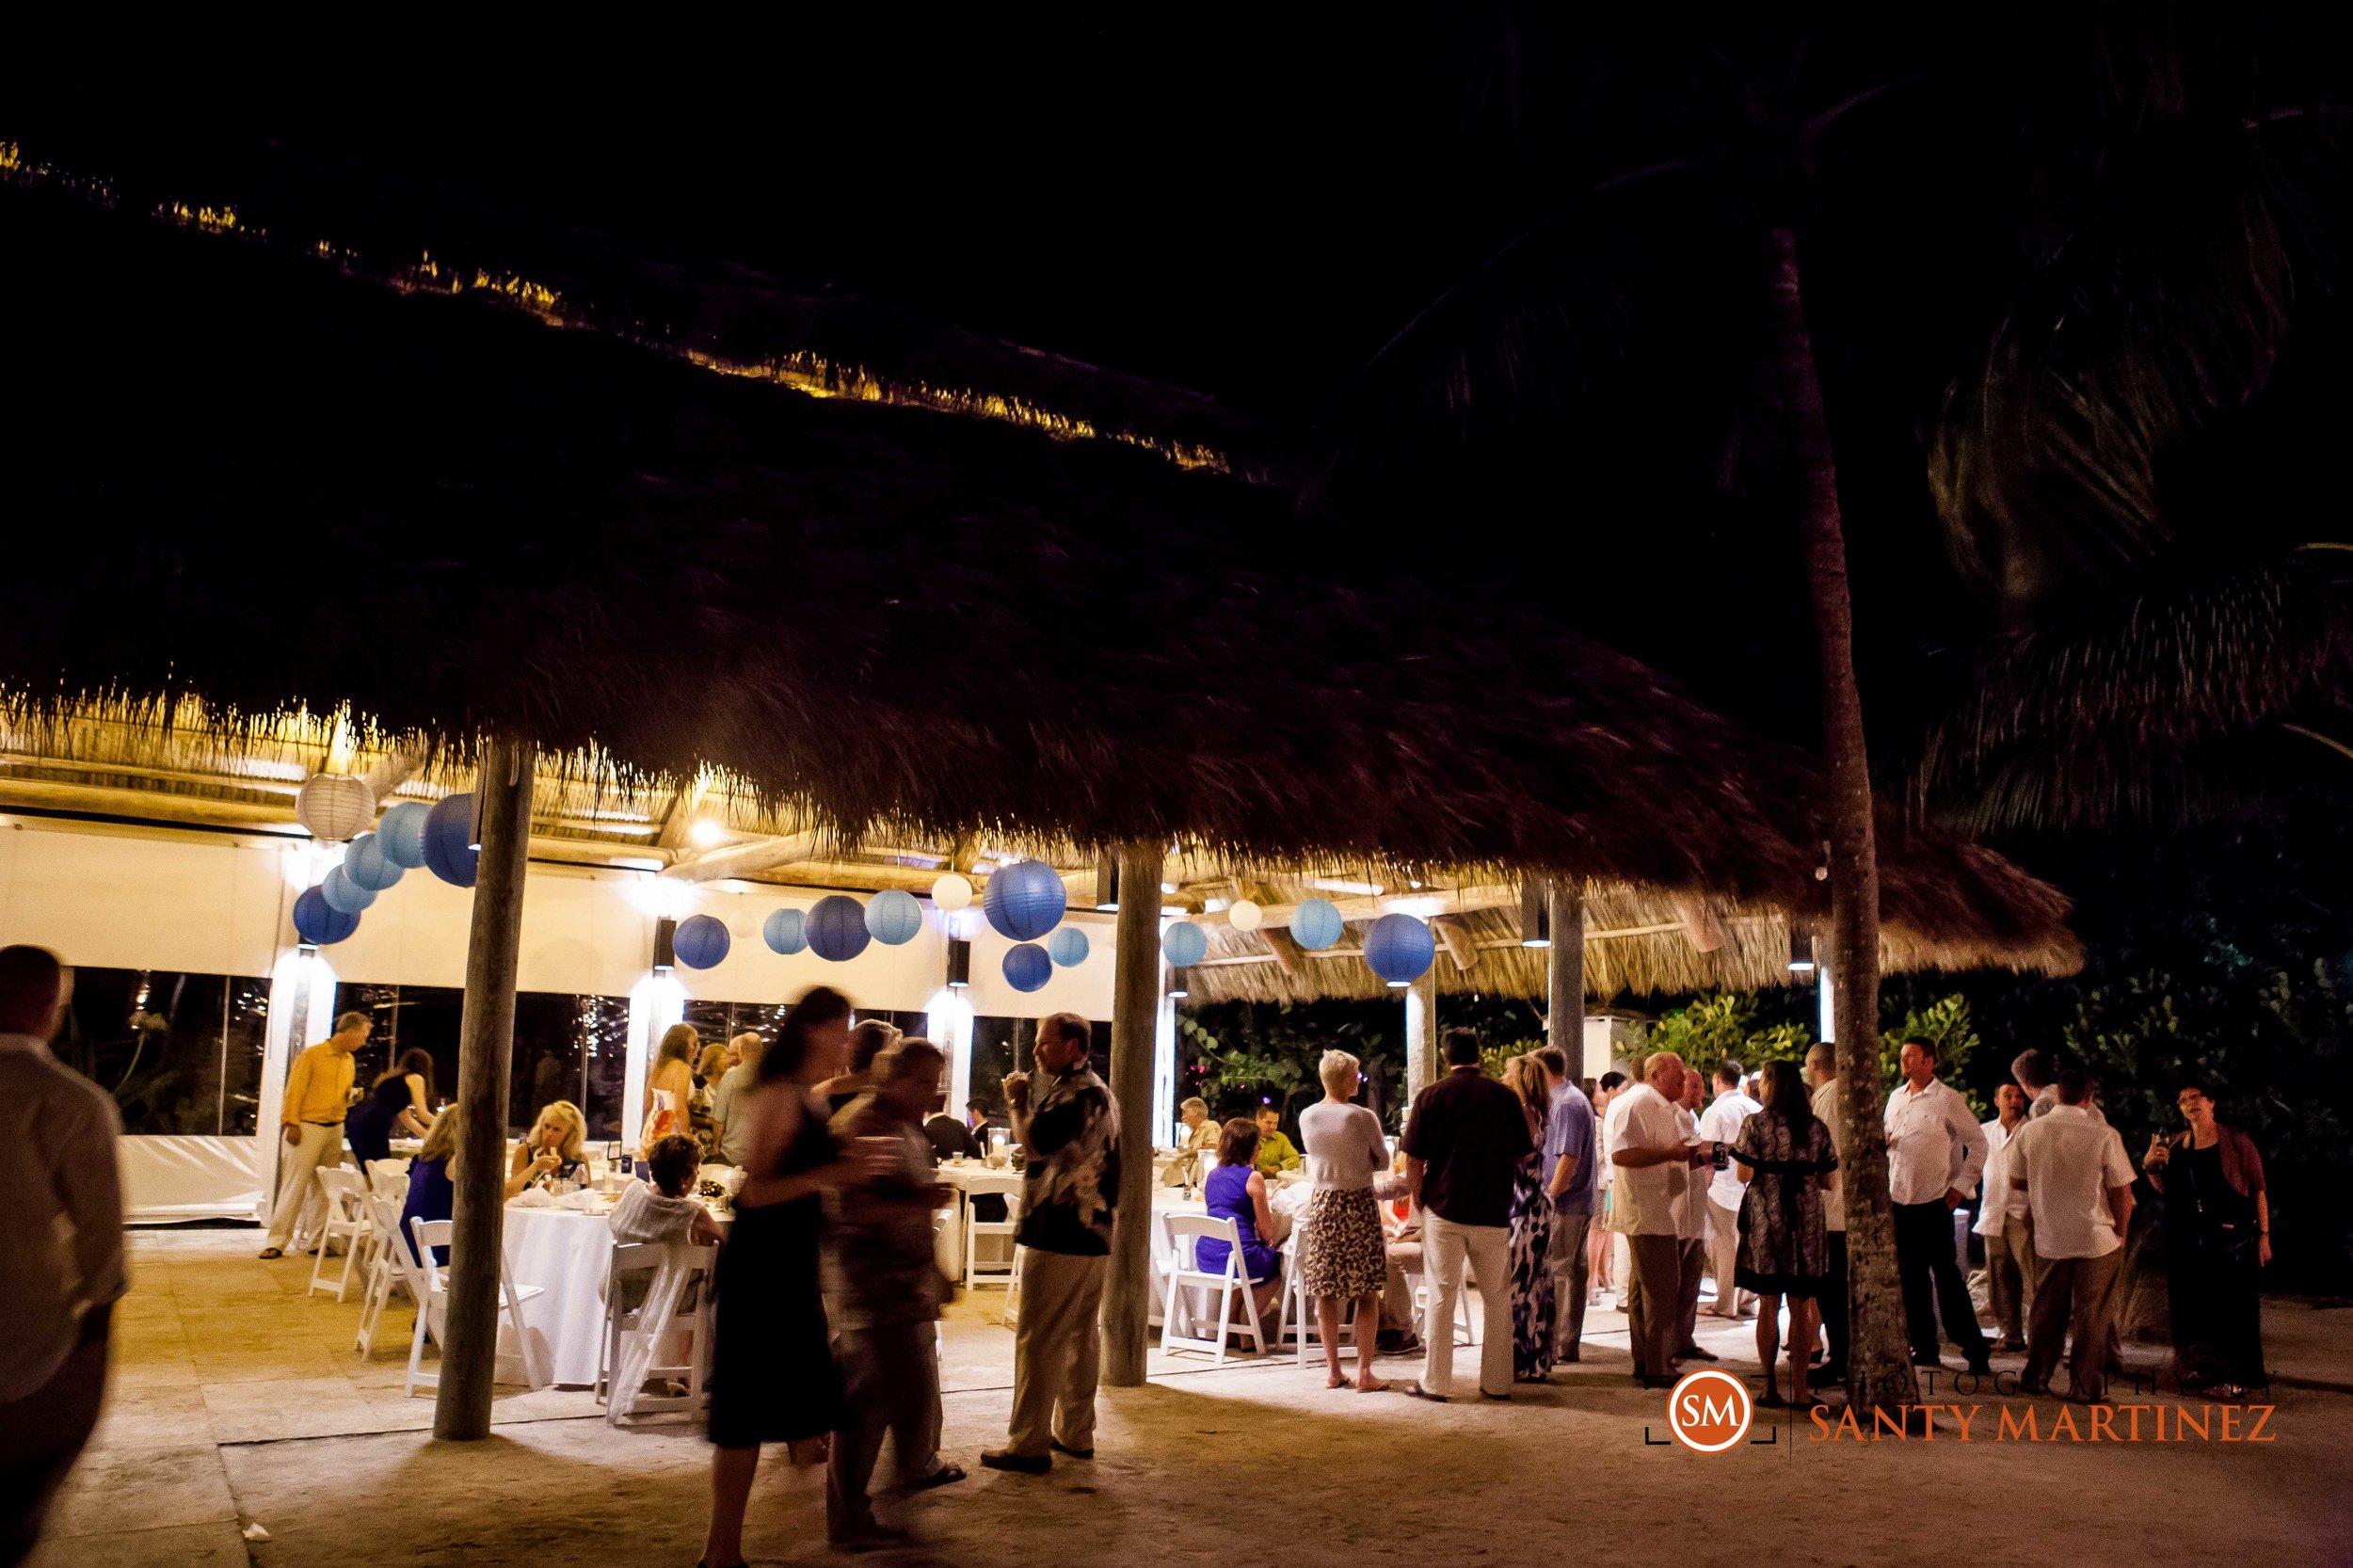 Photography by Santy Martinez - Miami Wedding Photographer-059.jpg